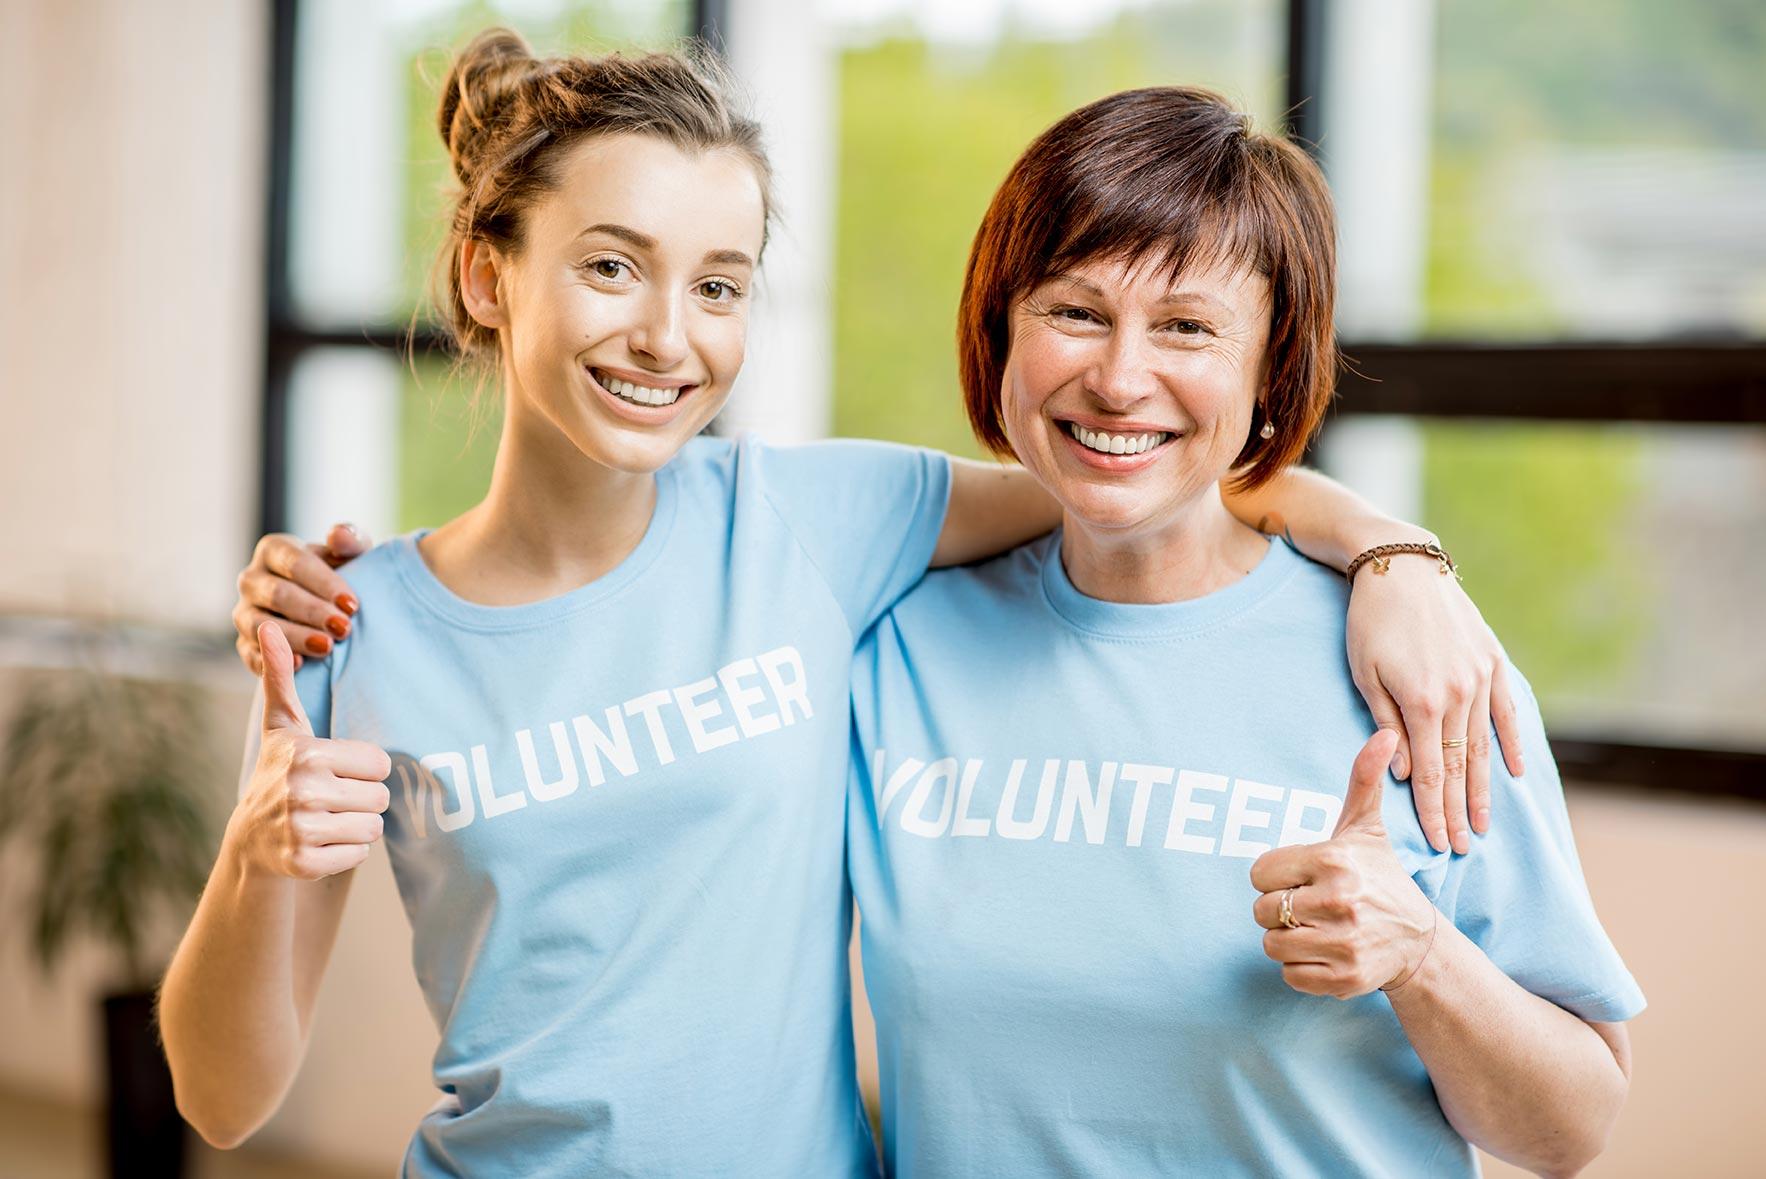 ChartPerfect EHR team volunteers